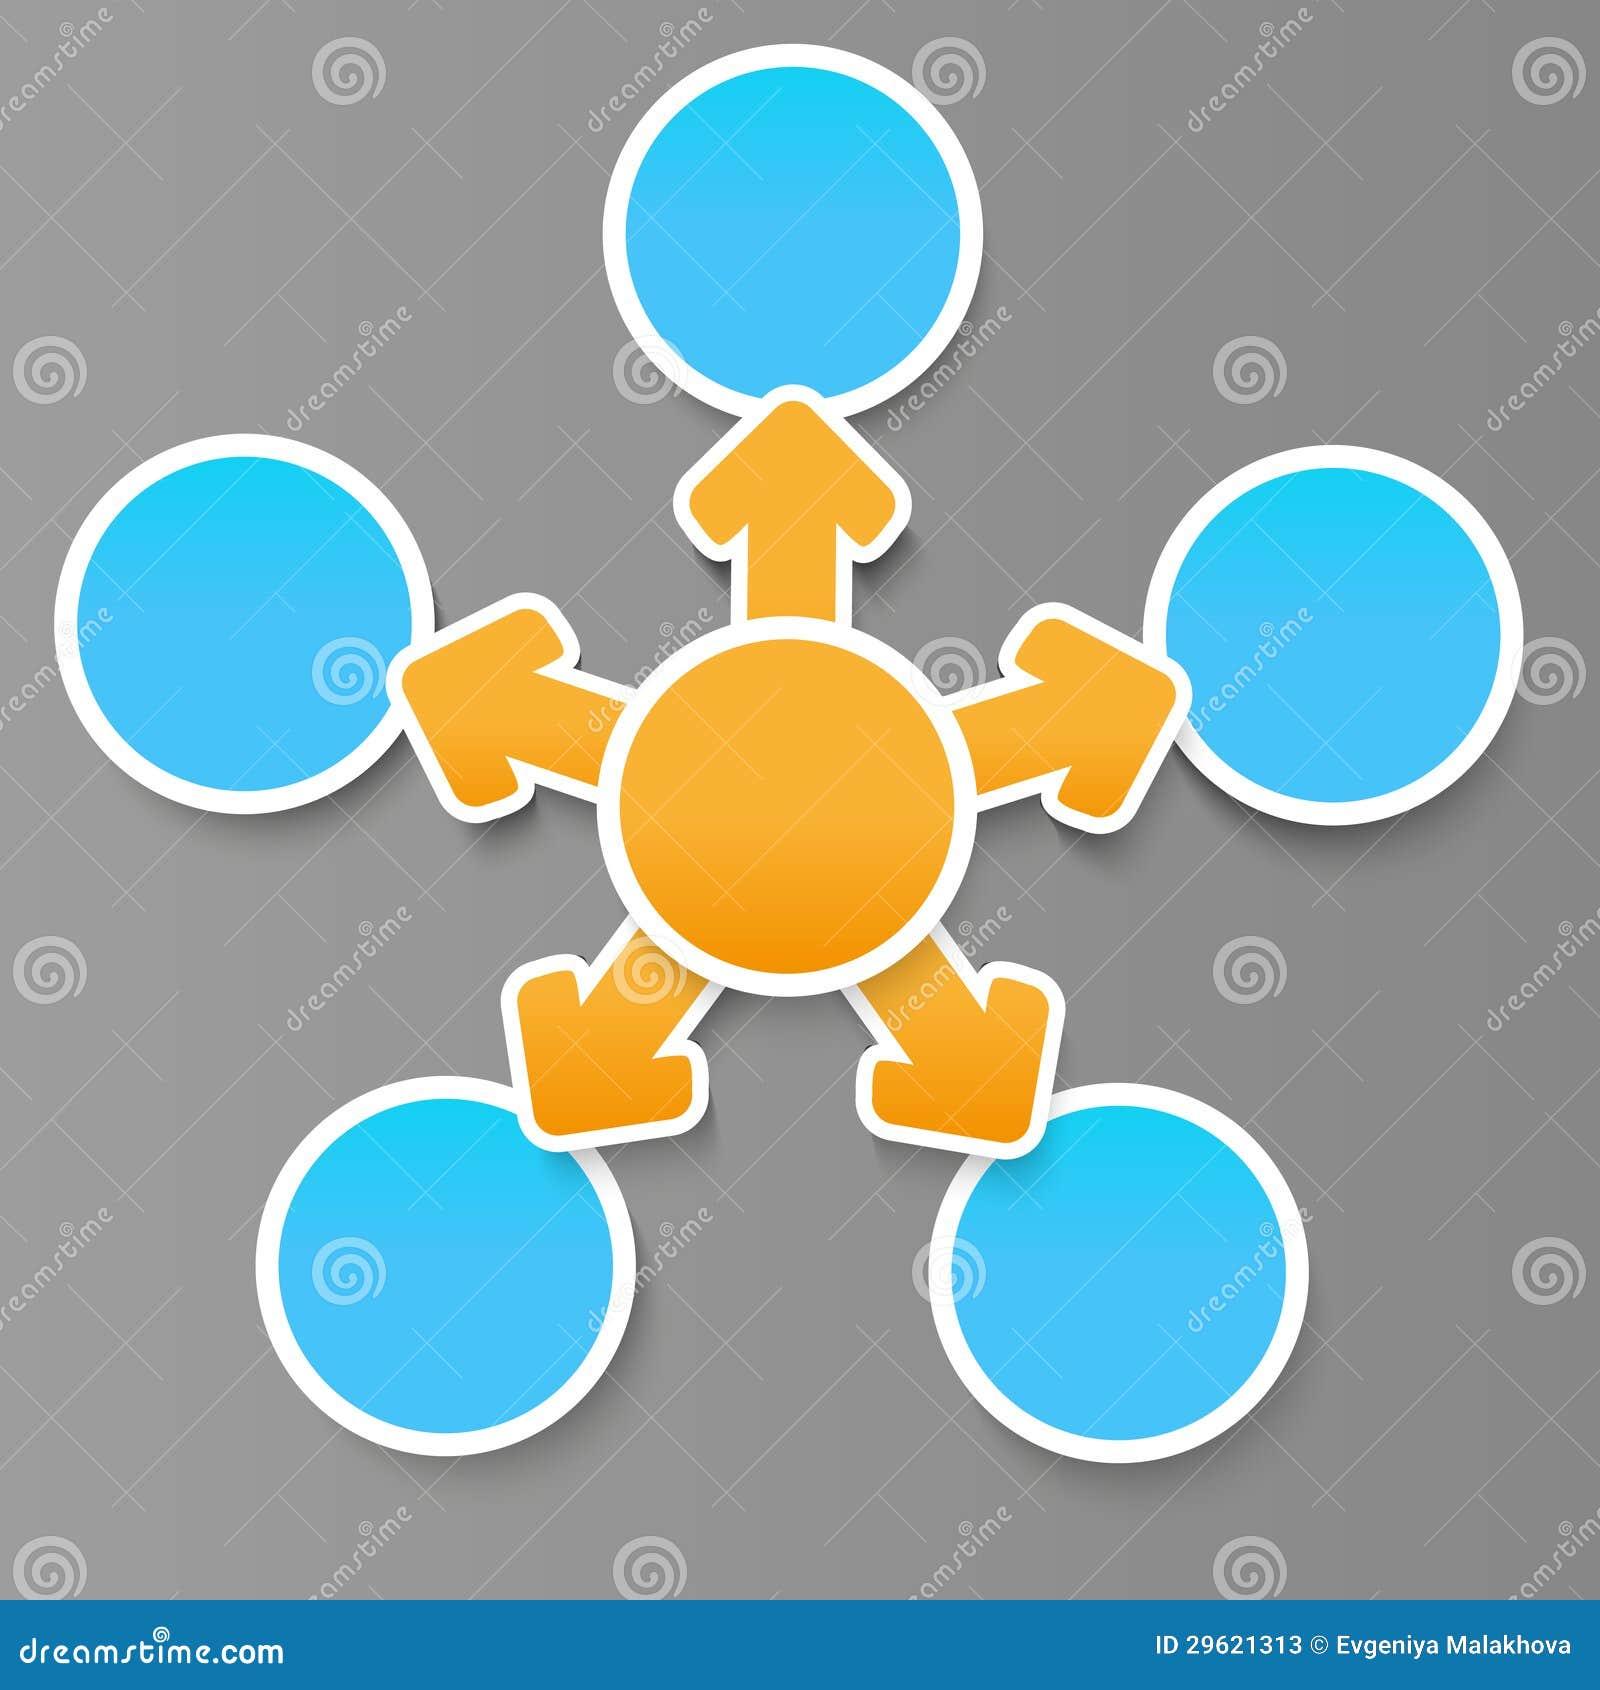 Flowchart for your design